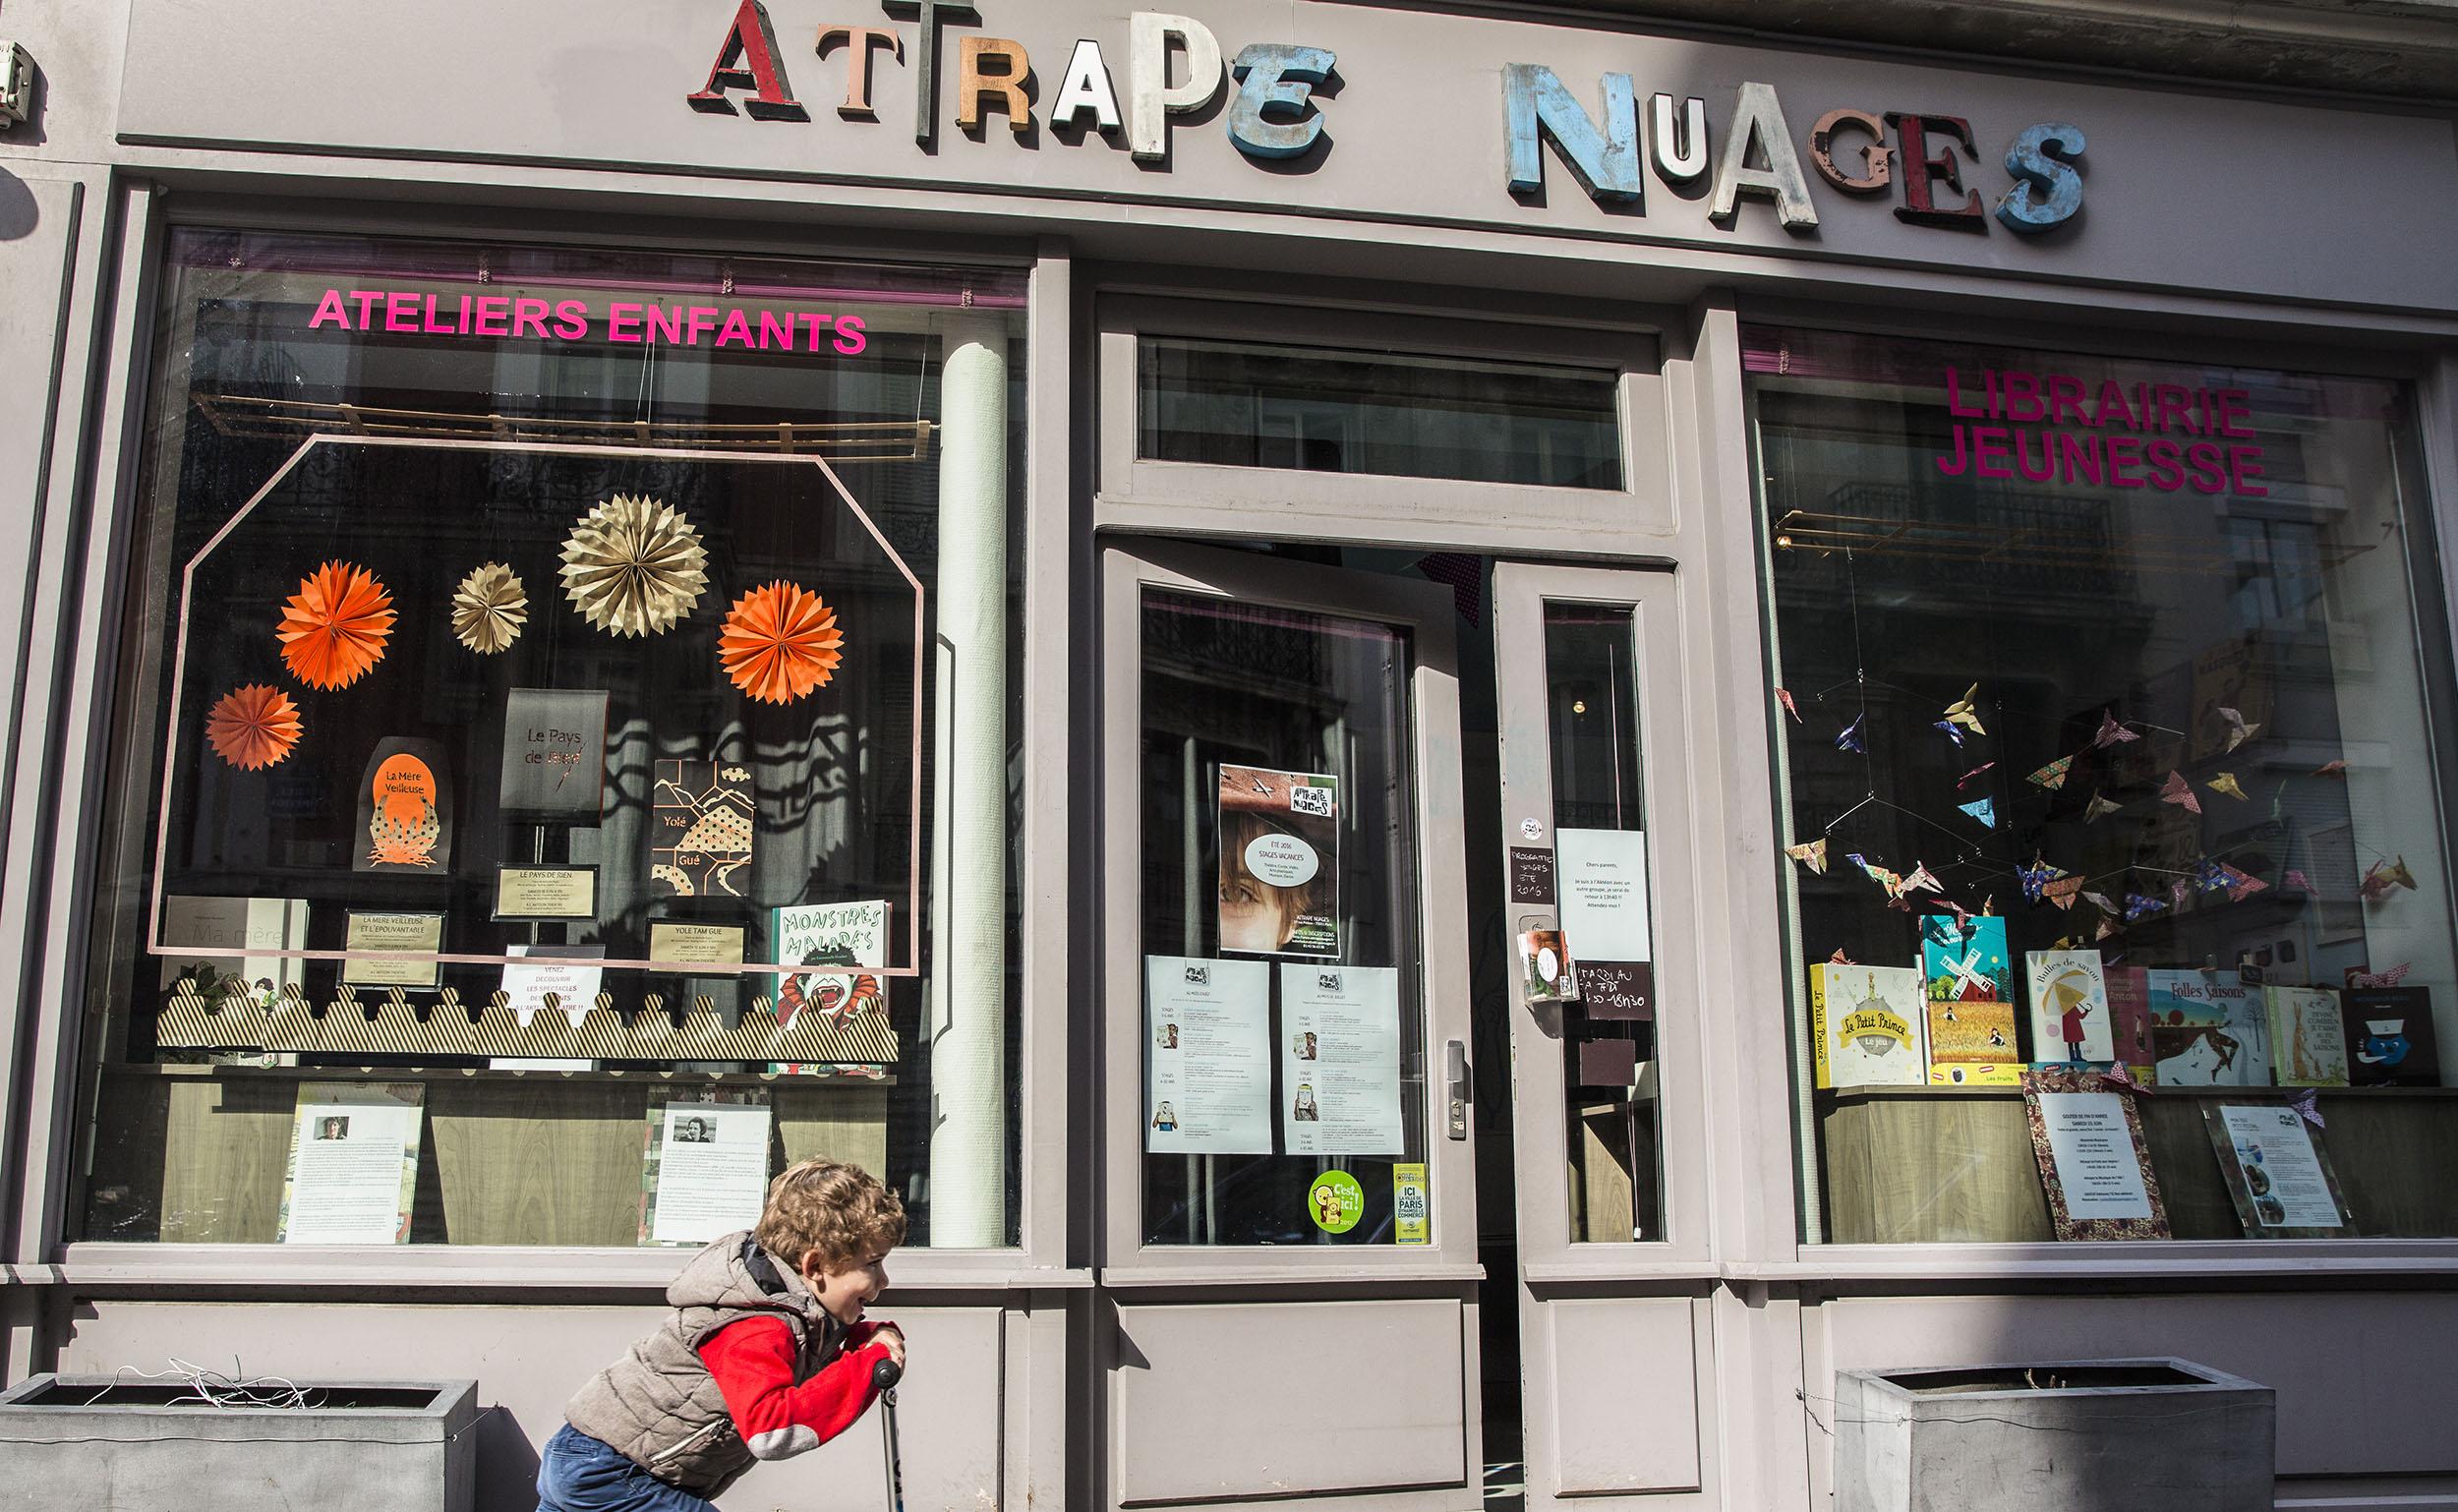 librairie attrape nuages paris